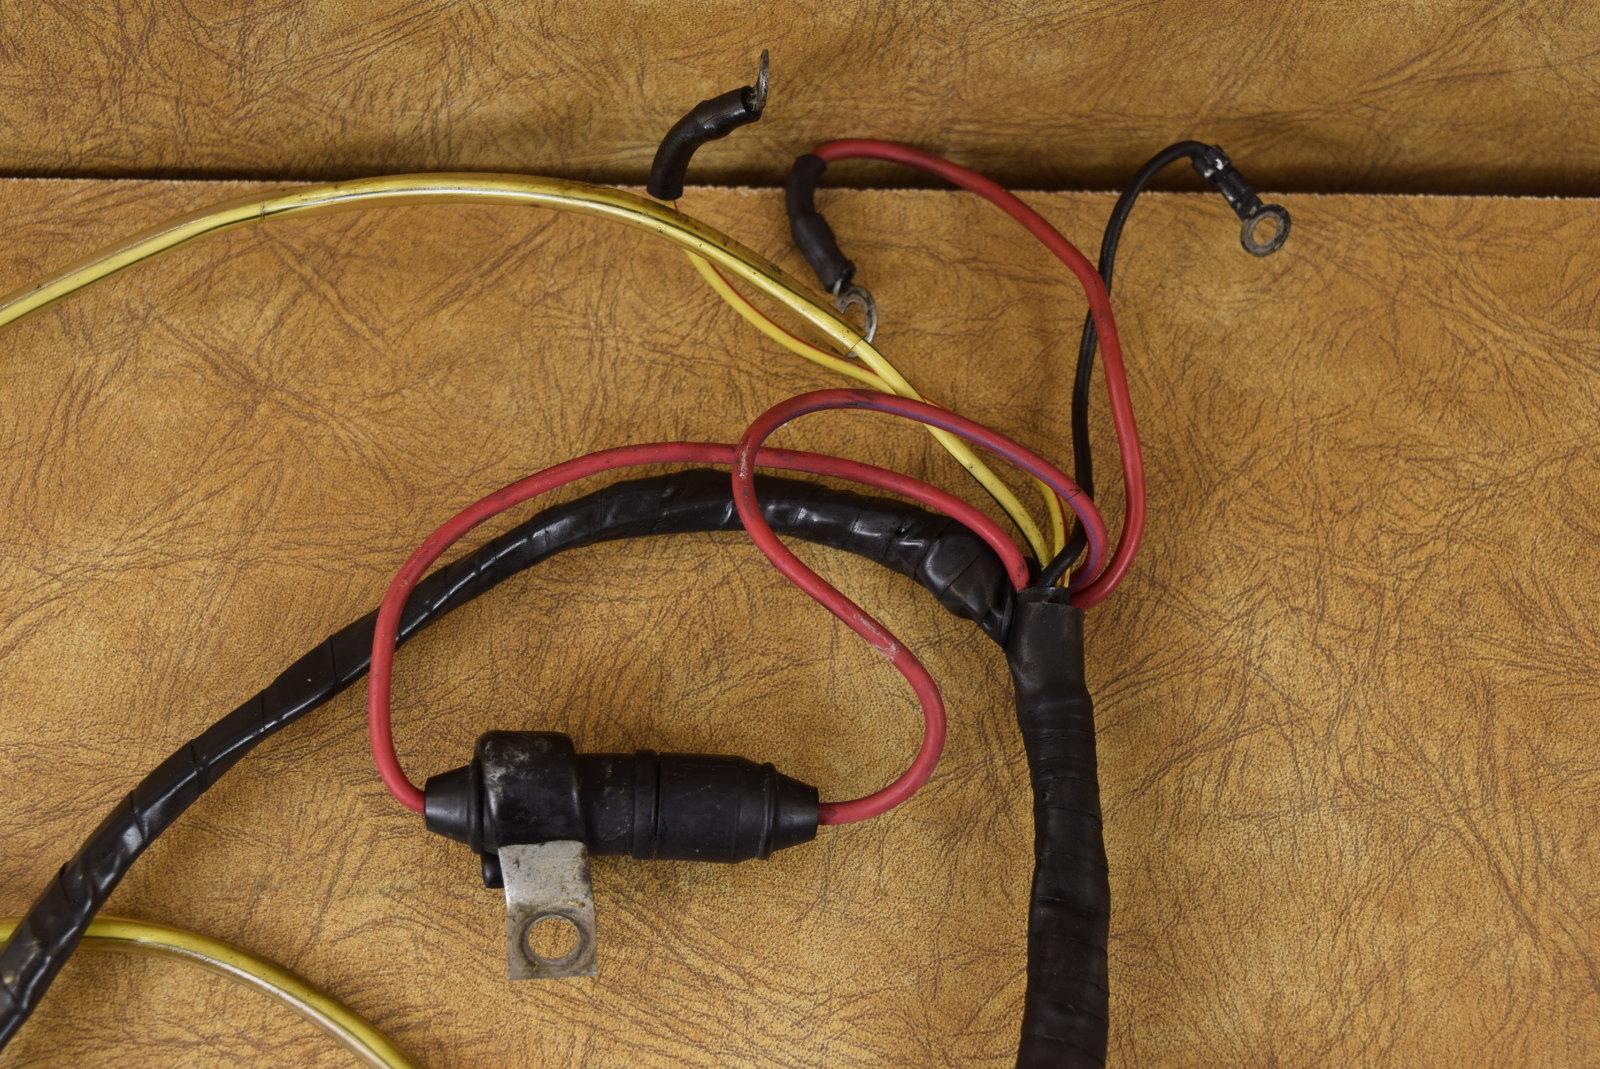 Mercury  U0026 Mariner Wiring Harness 96233a2 89915a1 1979